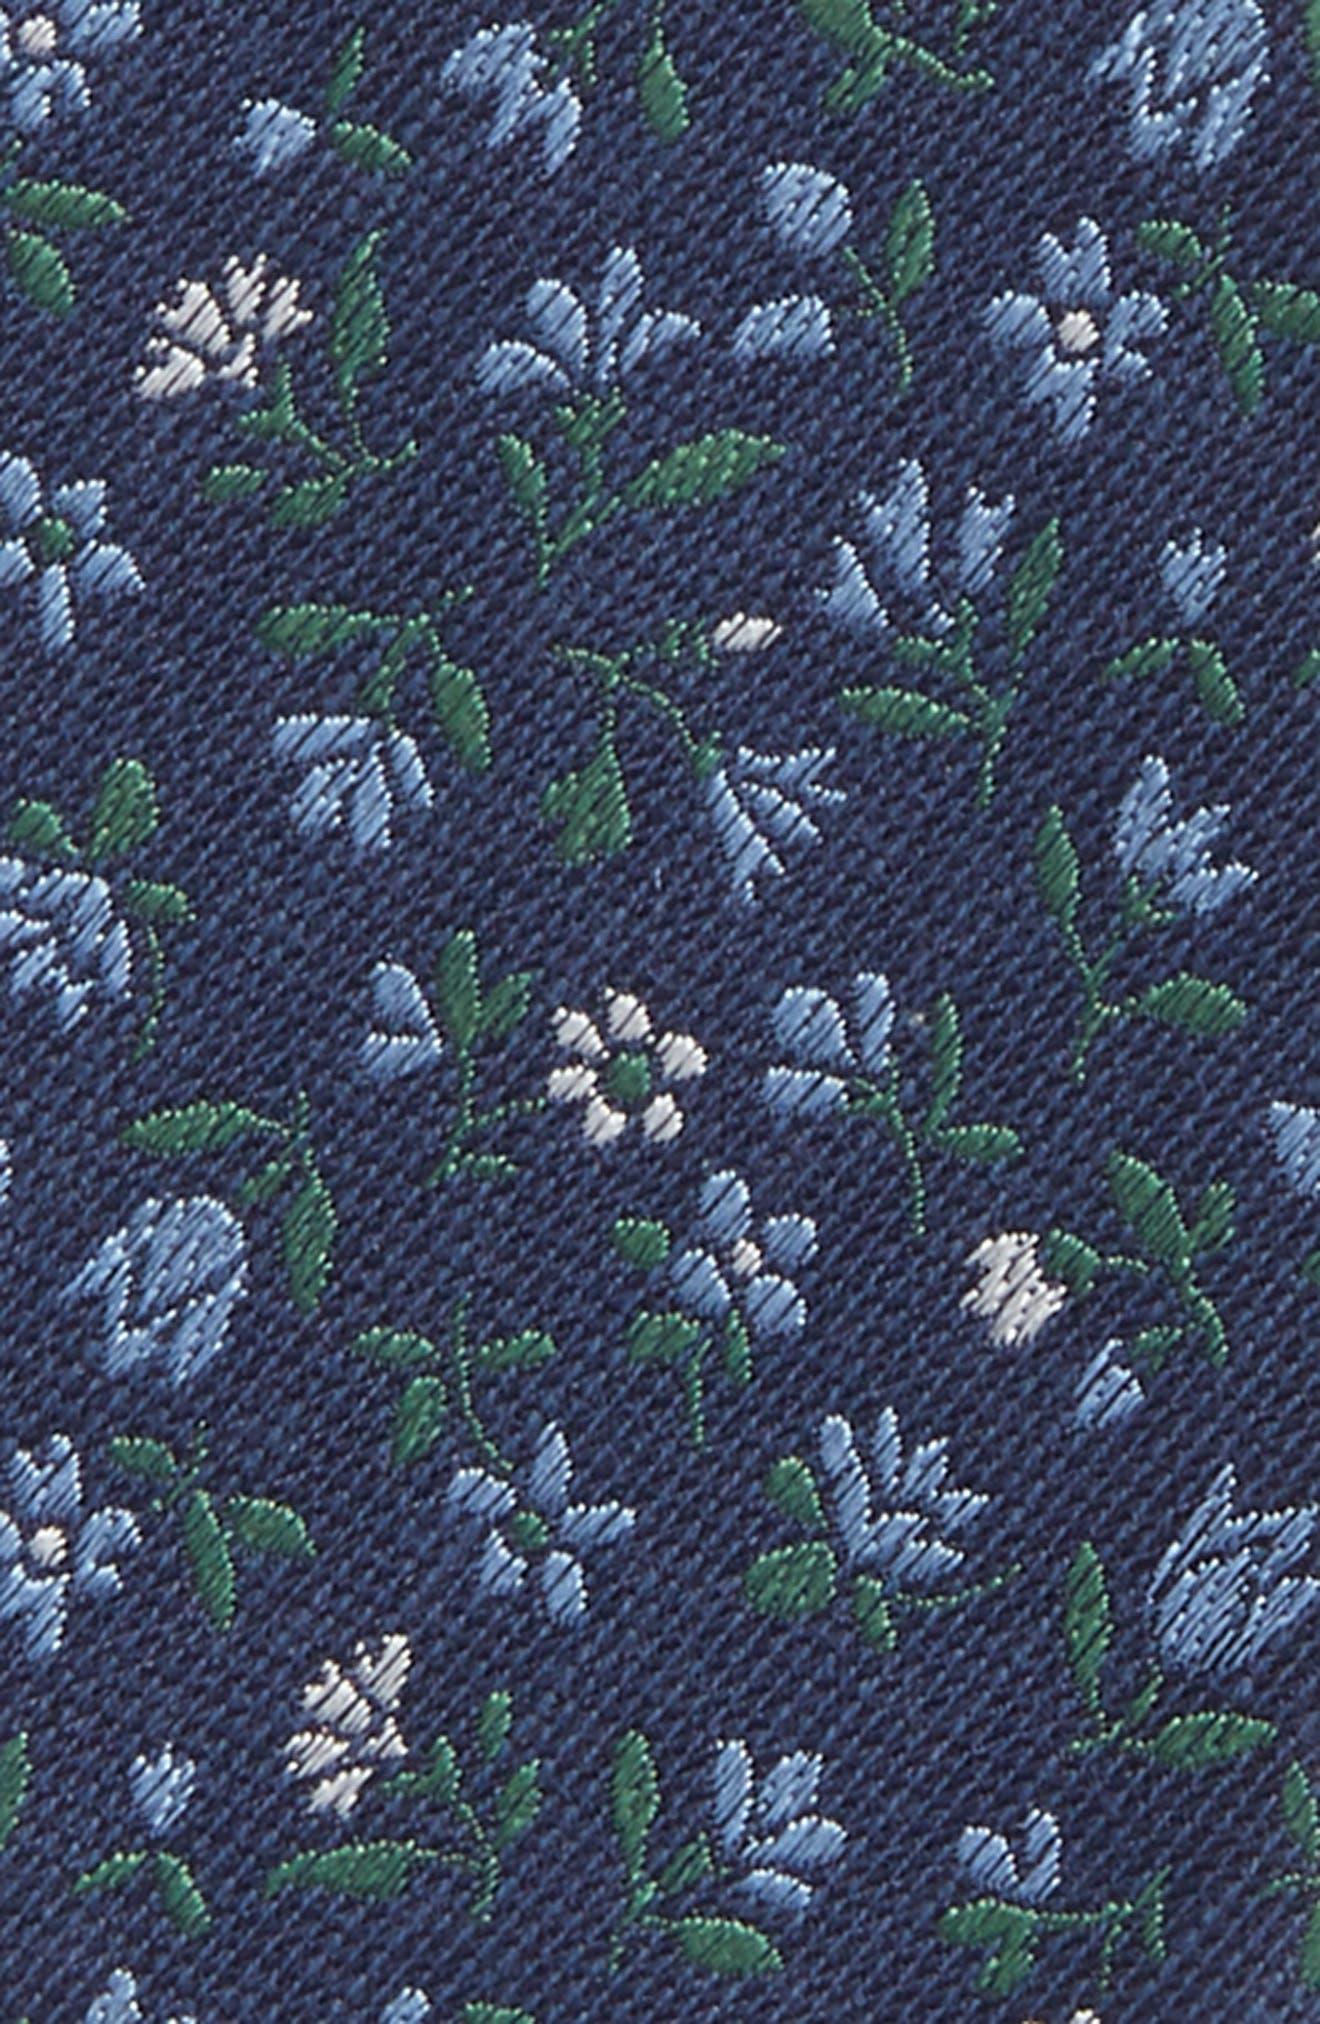 Floral Acres Bow Tie,                             Alternate thumbnail 3, color,                             Navy